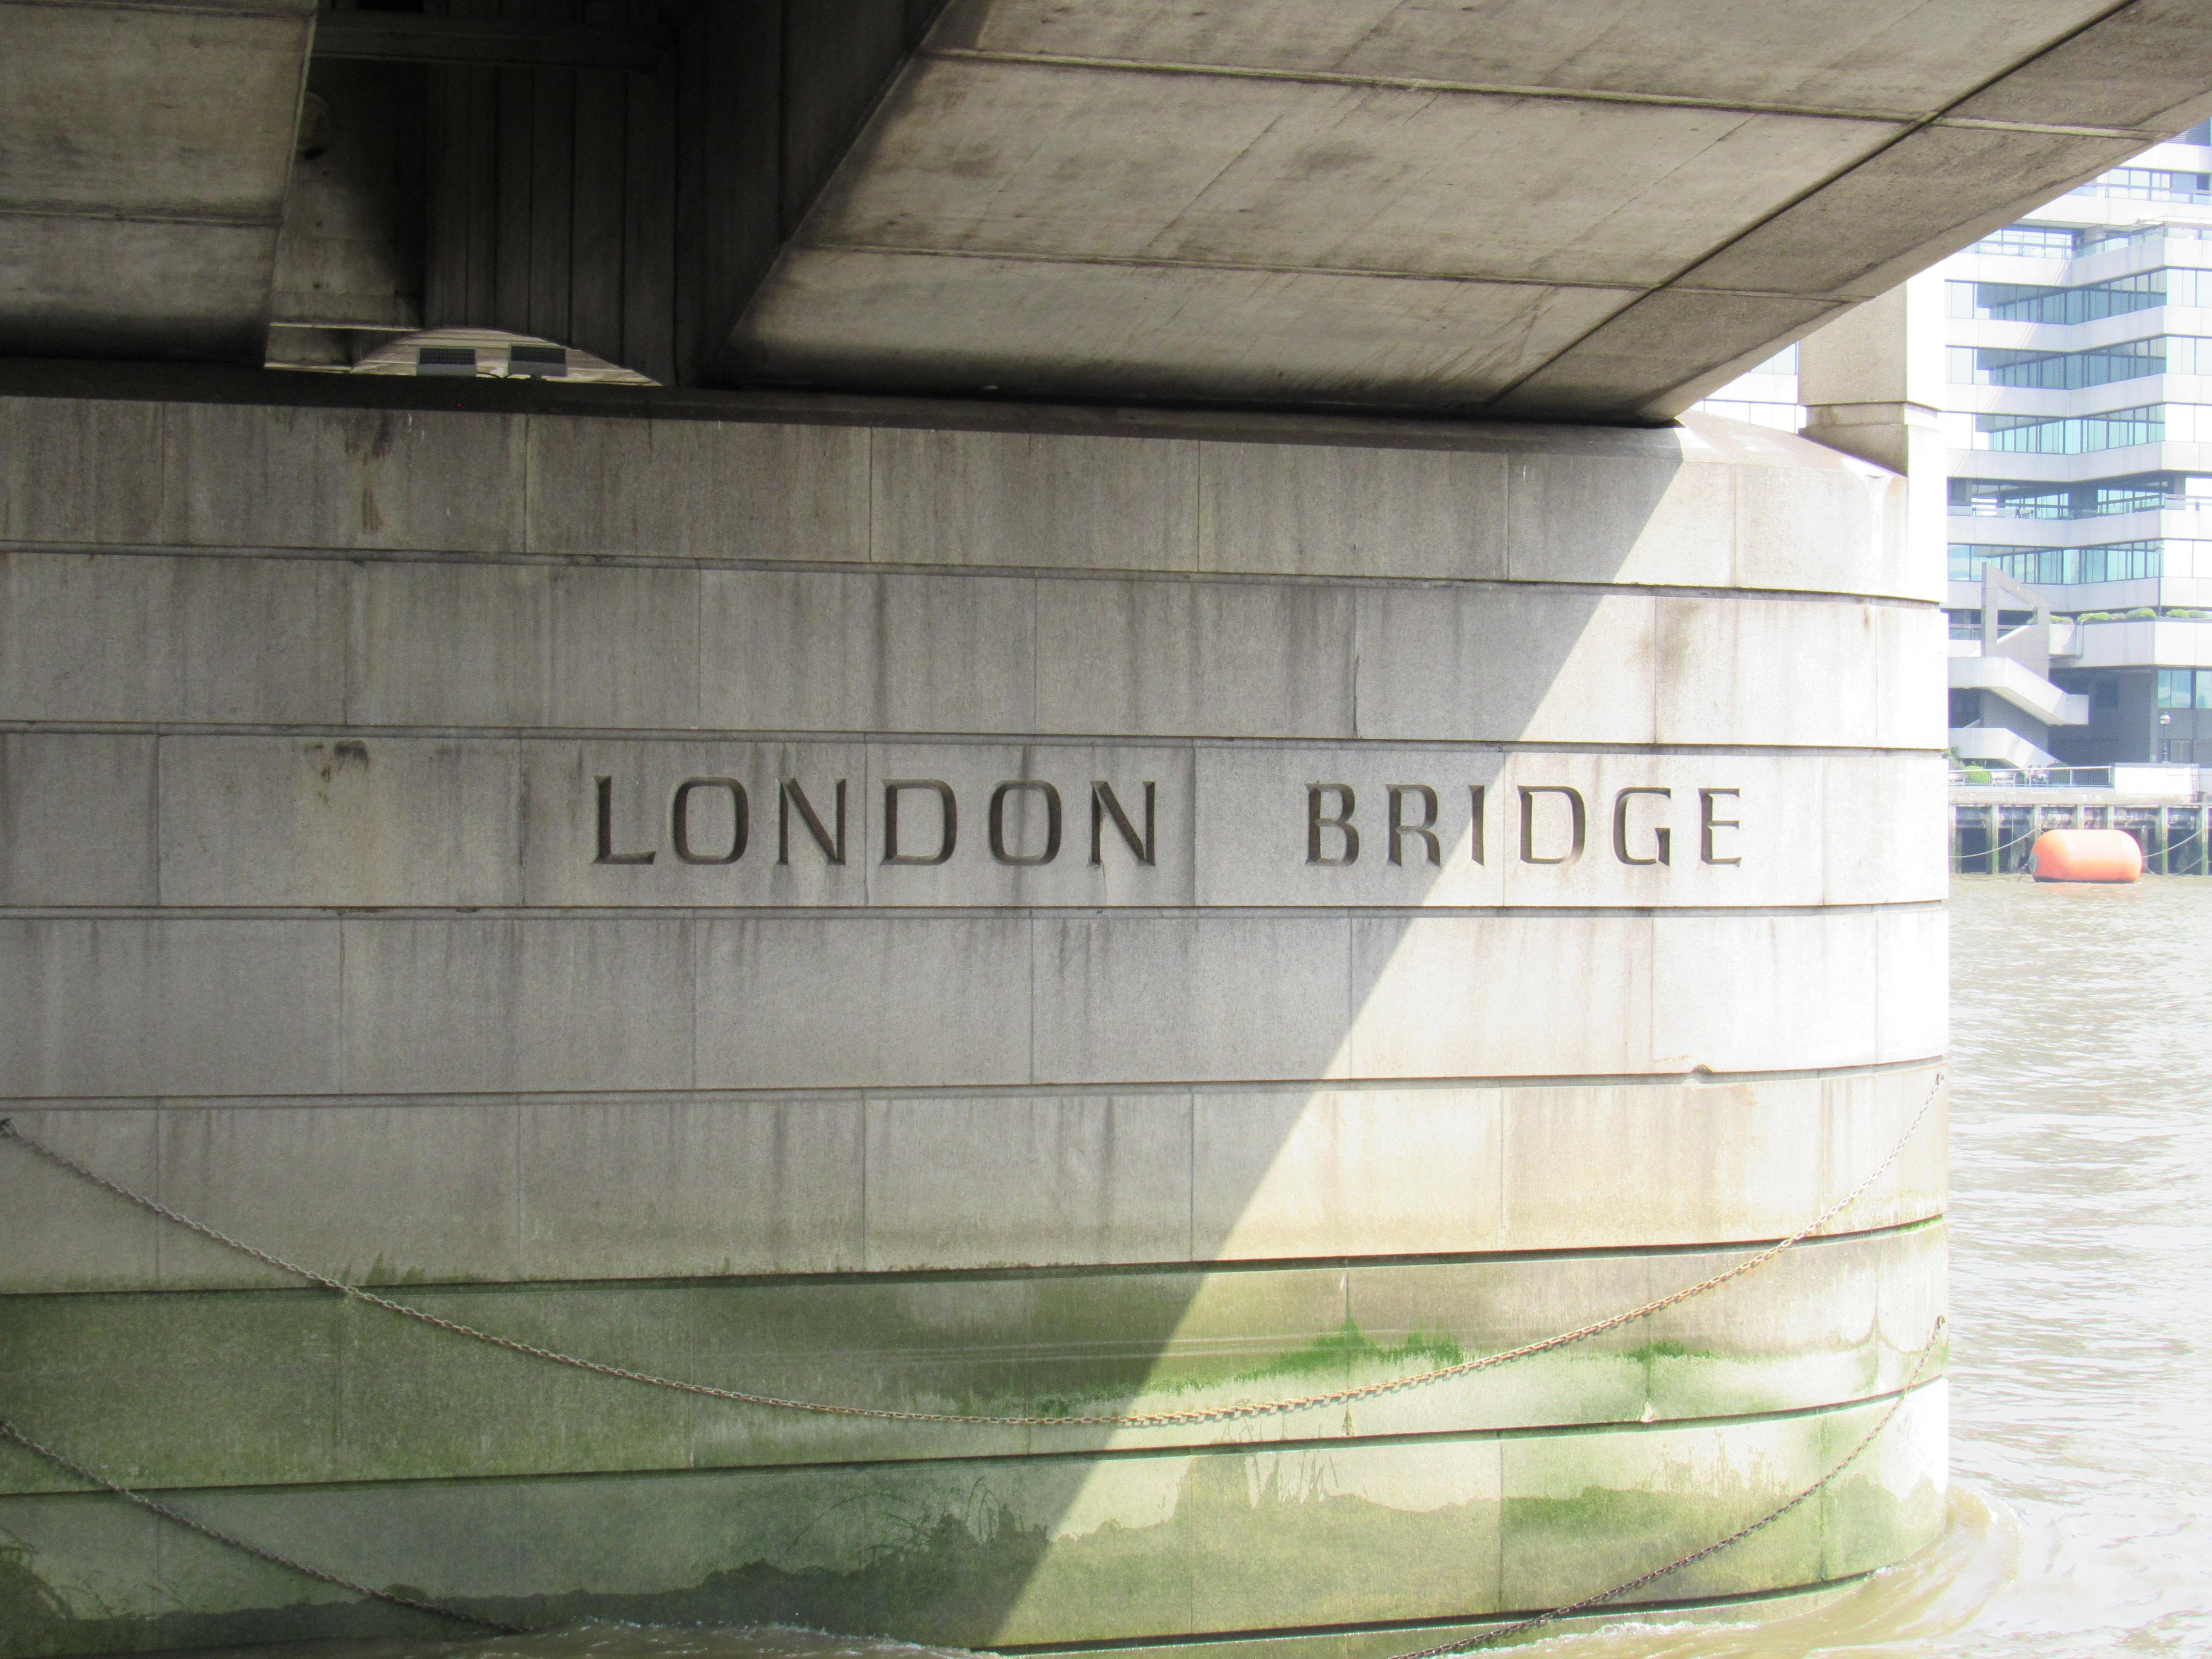 The London Bridge: A Hidden Label of Its Name